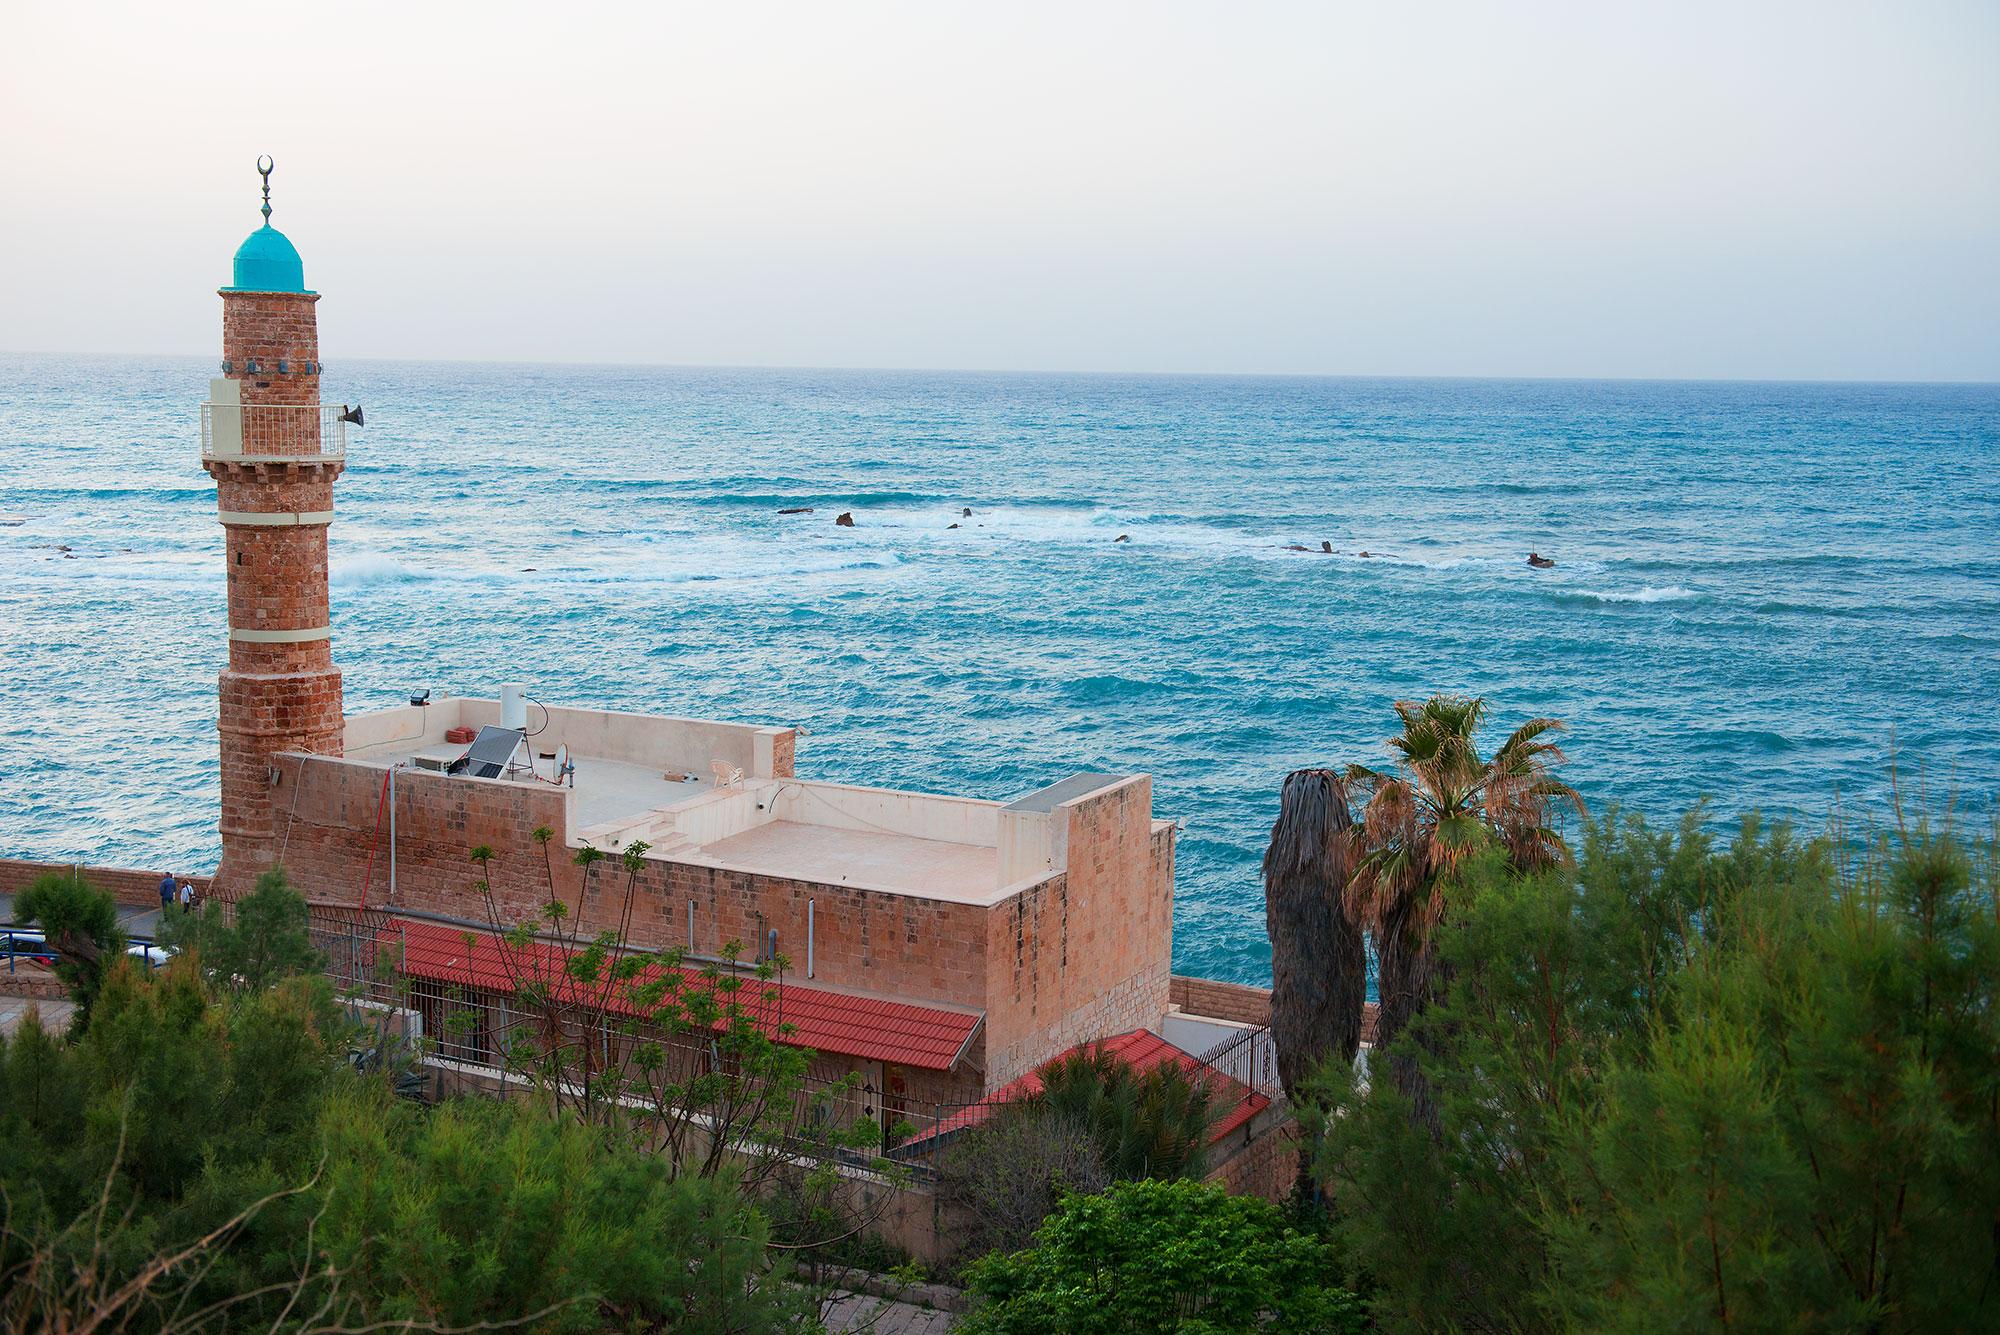 Tel Aviv Jaffa, Israel